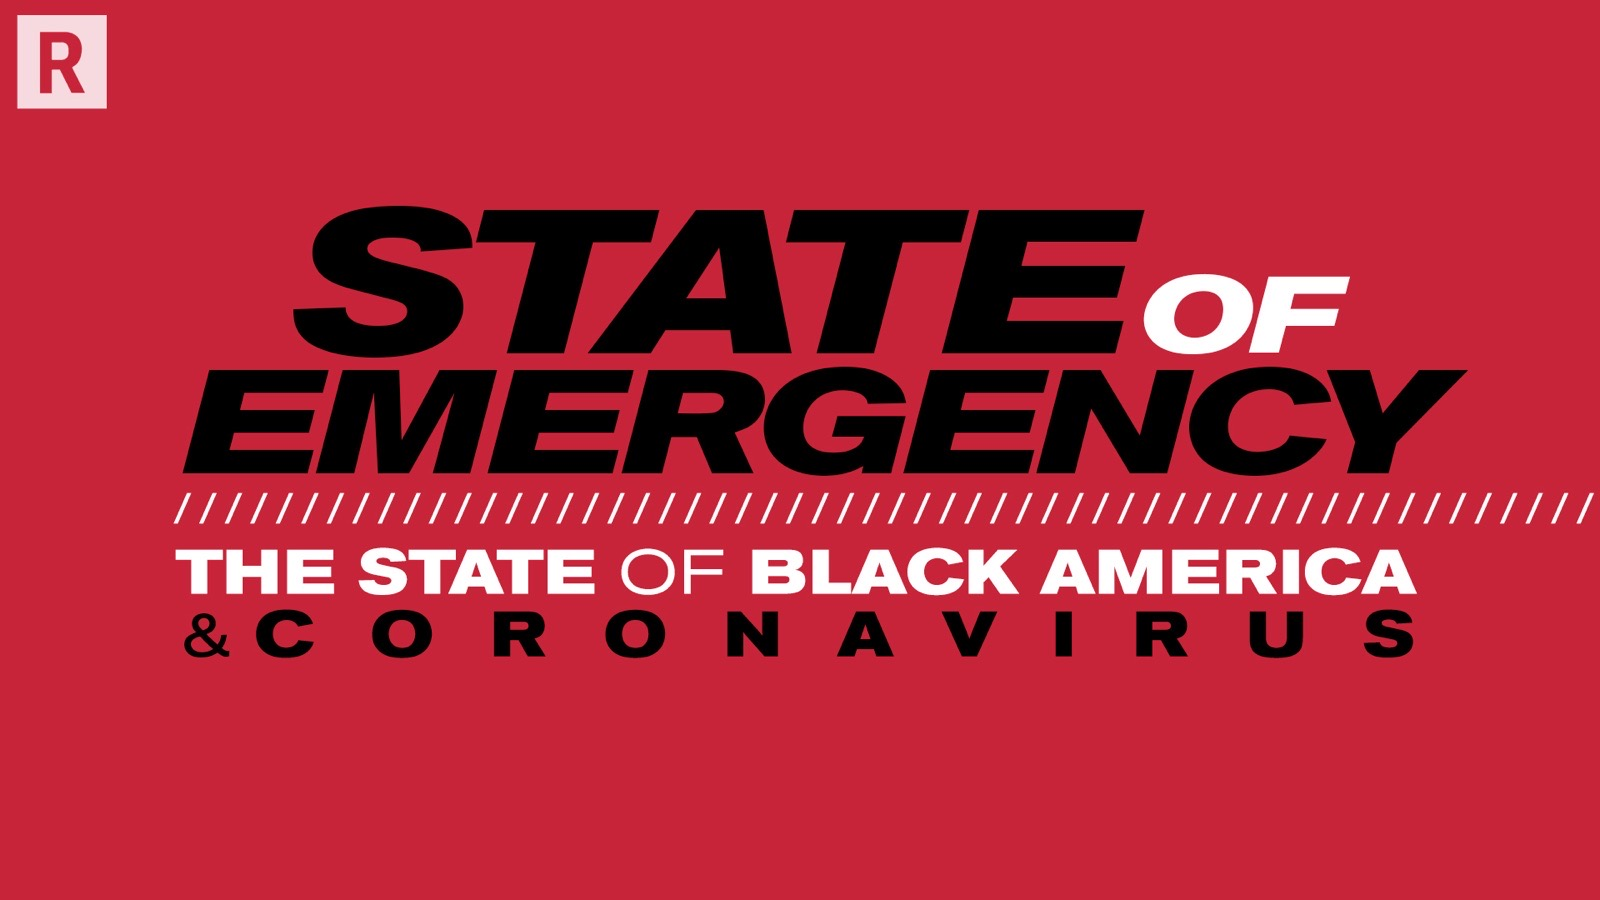 """State Of Emergency: The State of Black America & Coronavirus"""